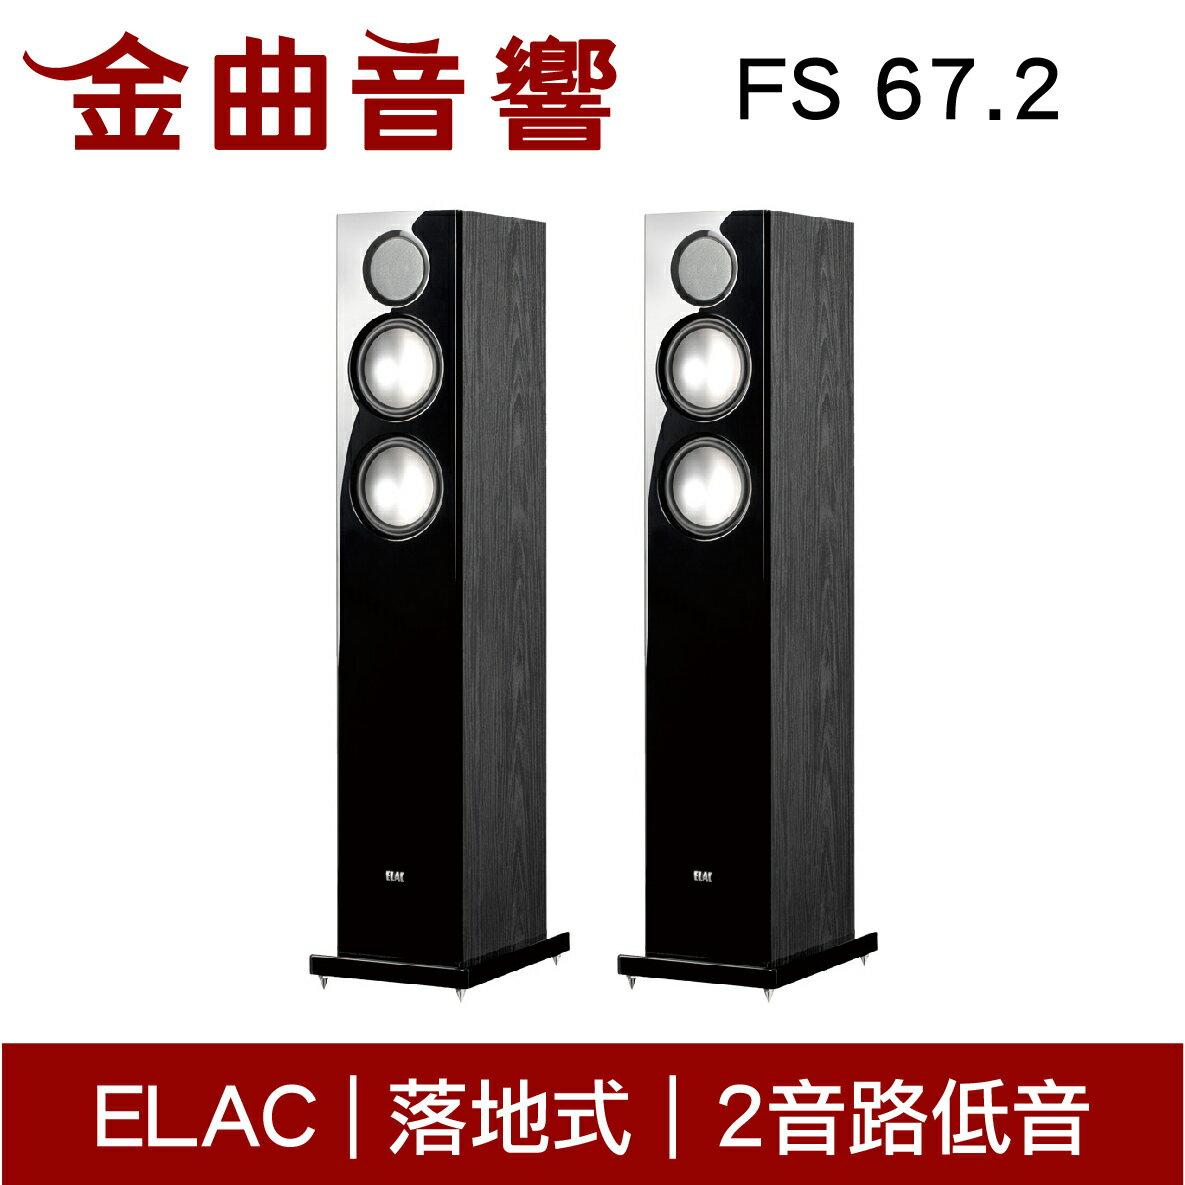 ELAC FS 67.2 霧黑木紋 落地式 揚聲器 音響(一對)| 金曲音響